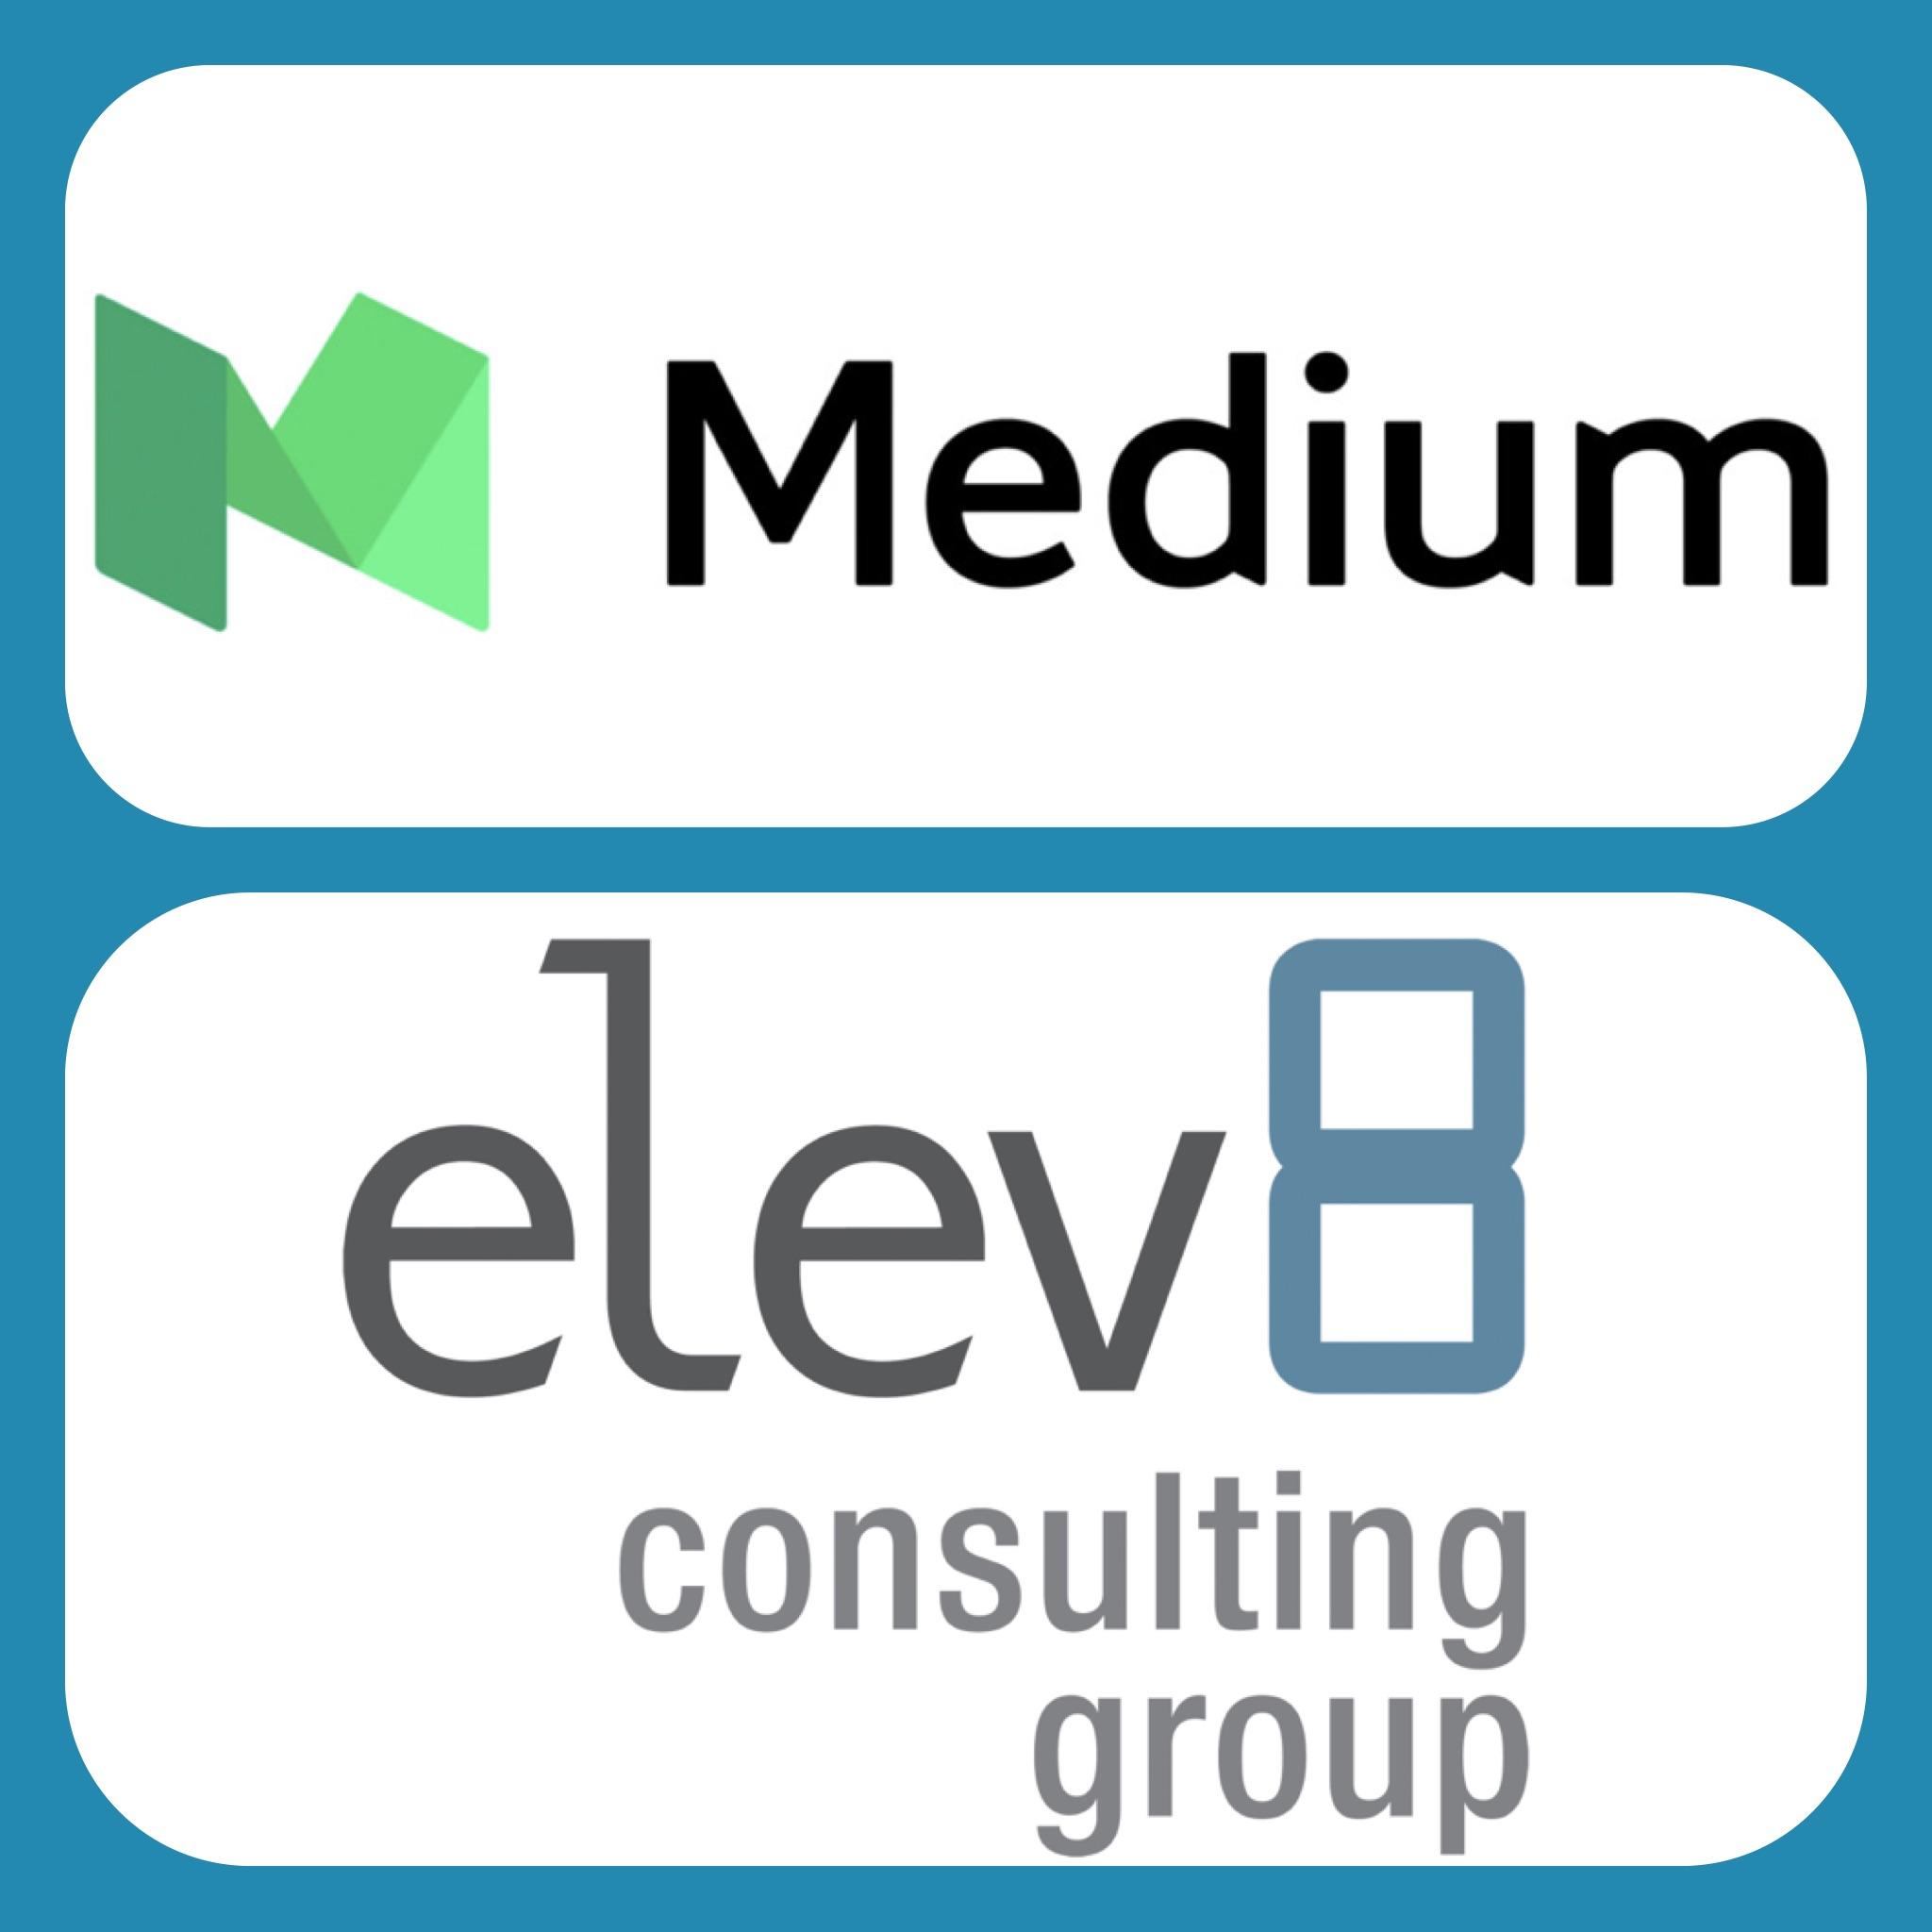 medium-elev8 consulting group